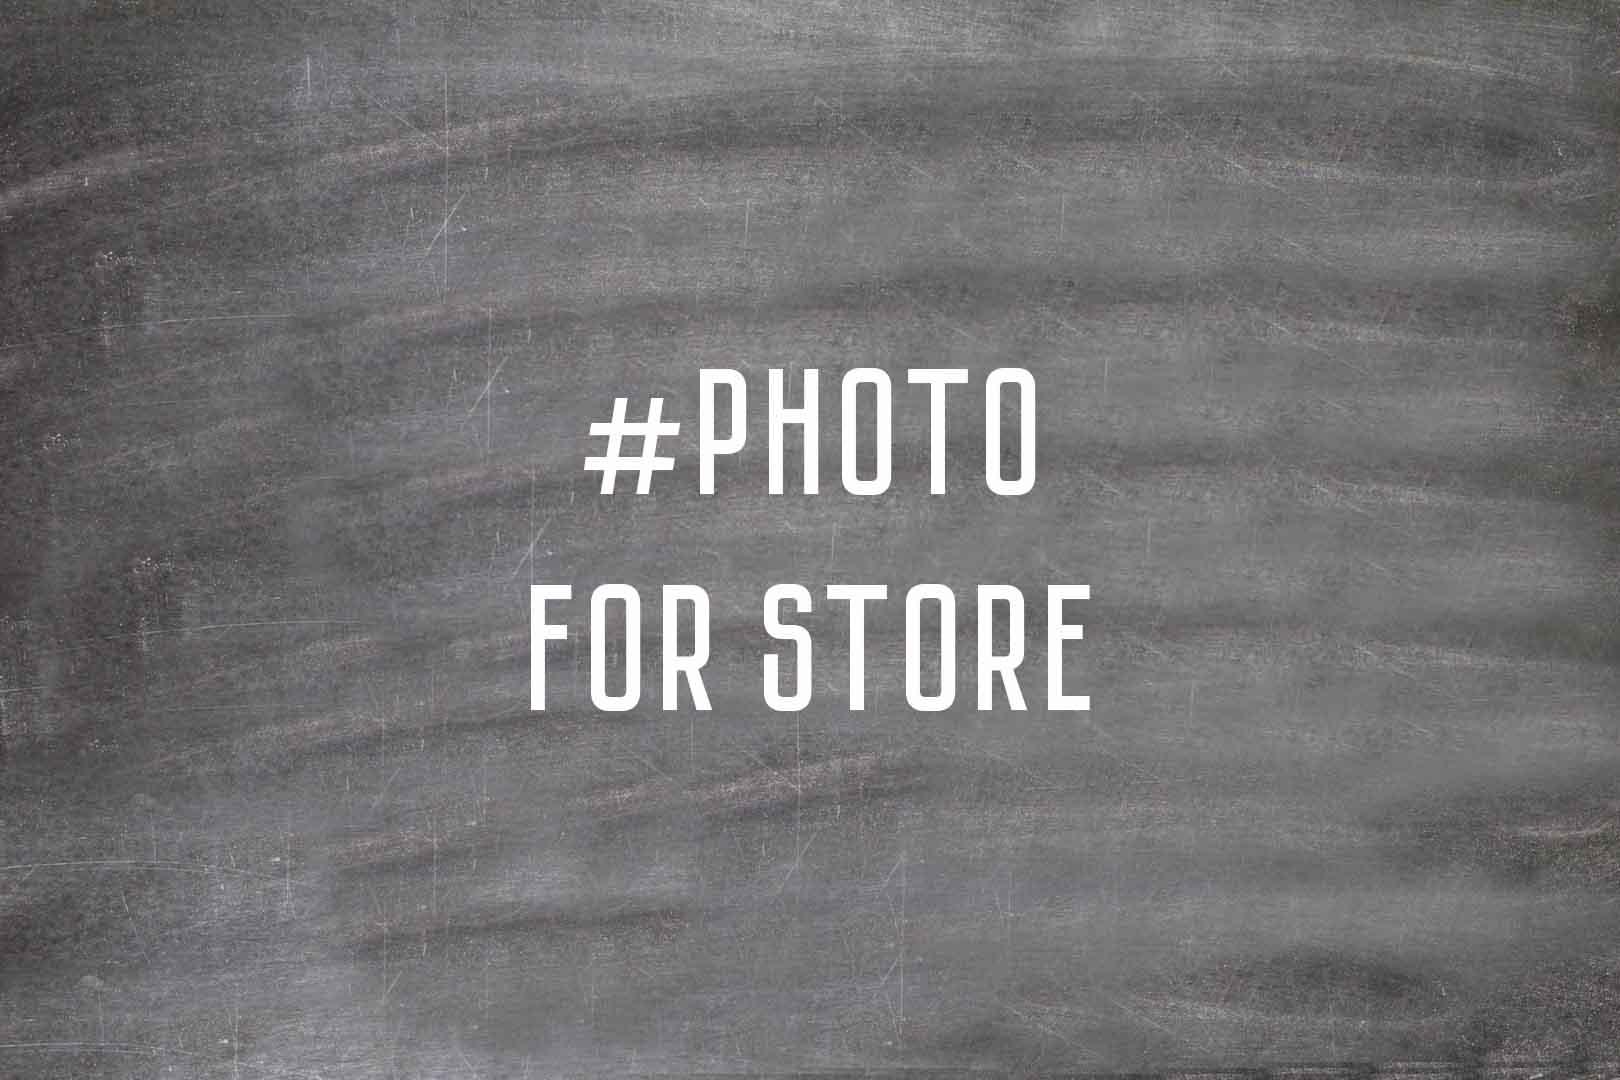 Фото для интернет-магазина